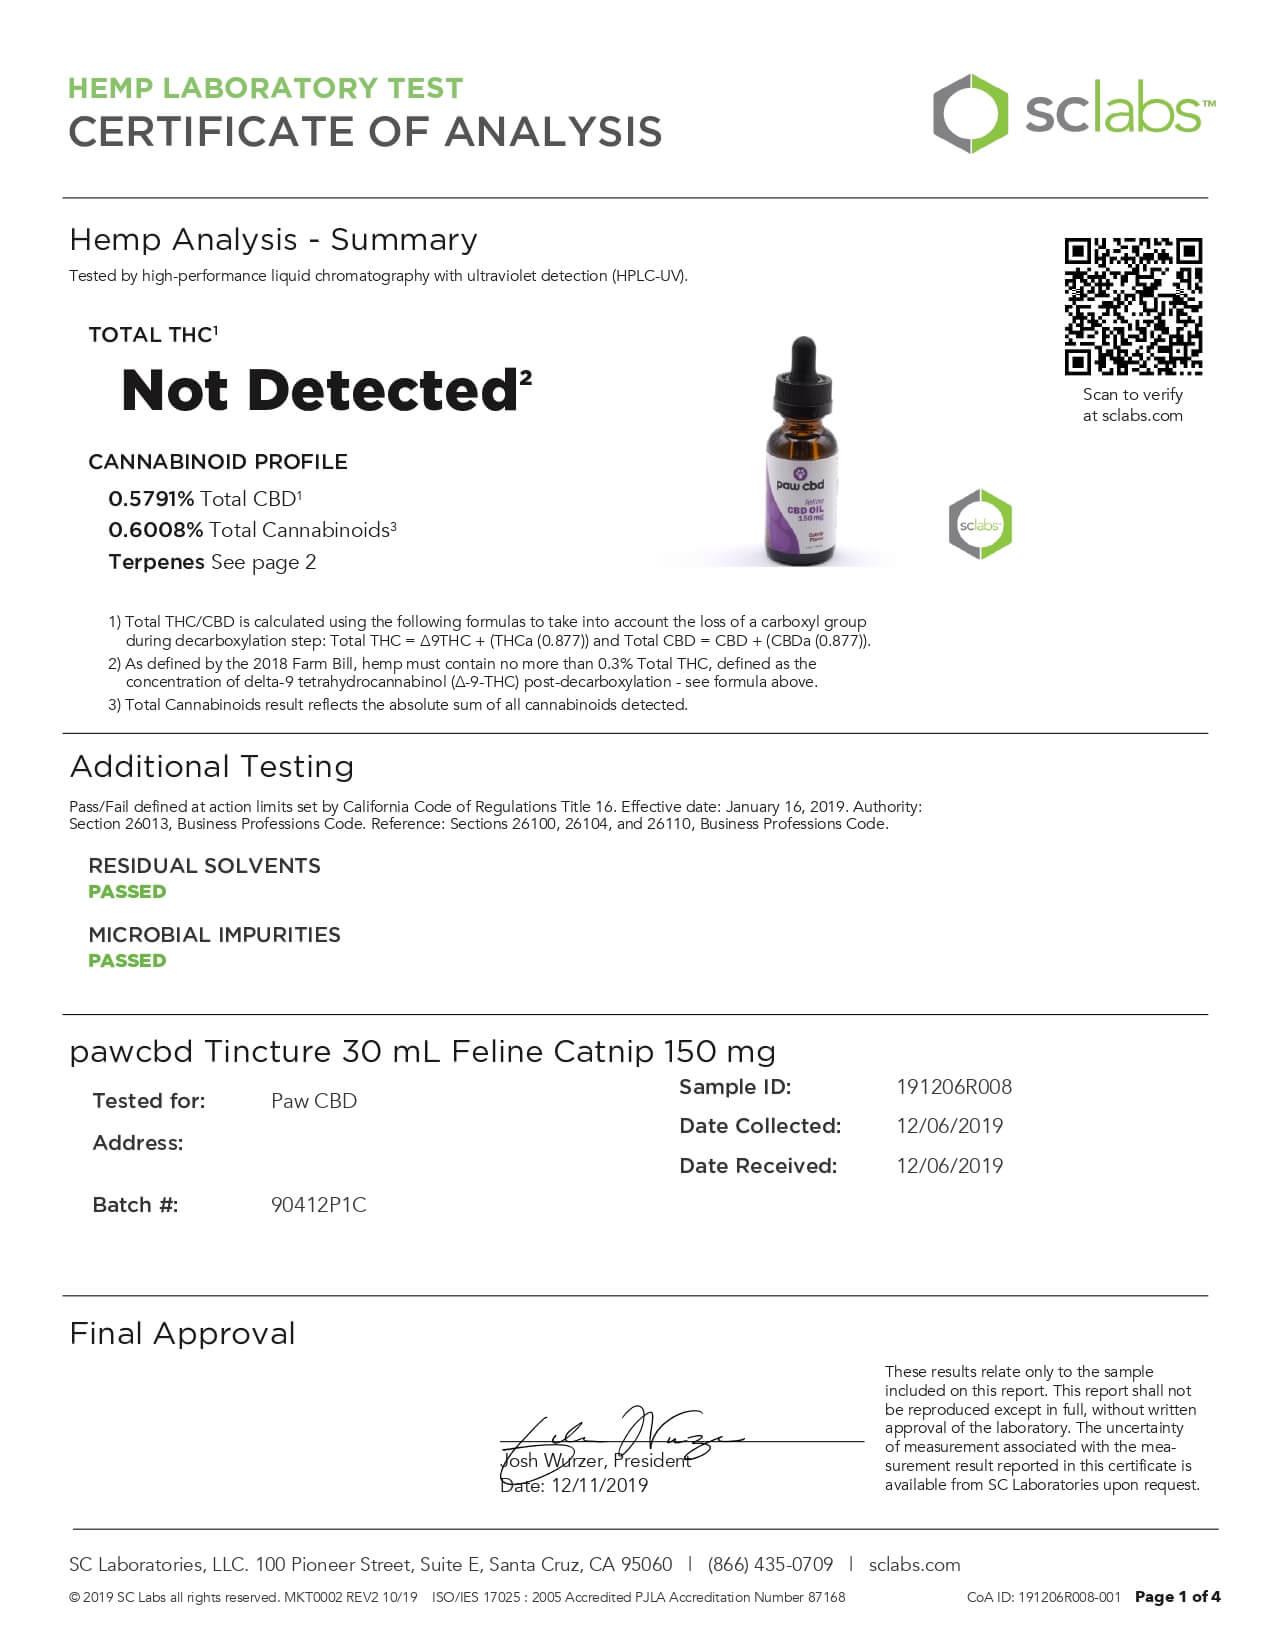 cbdMD CBD Pet Tincture Catnip Flavored for Felines 150mg Lab Report